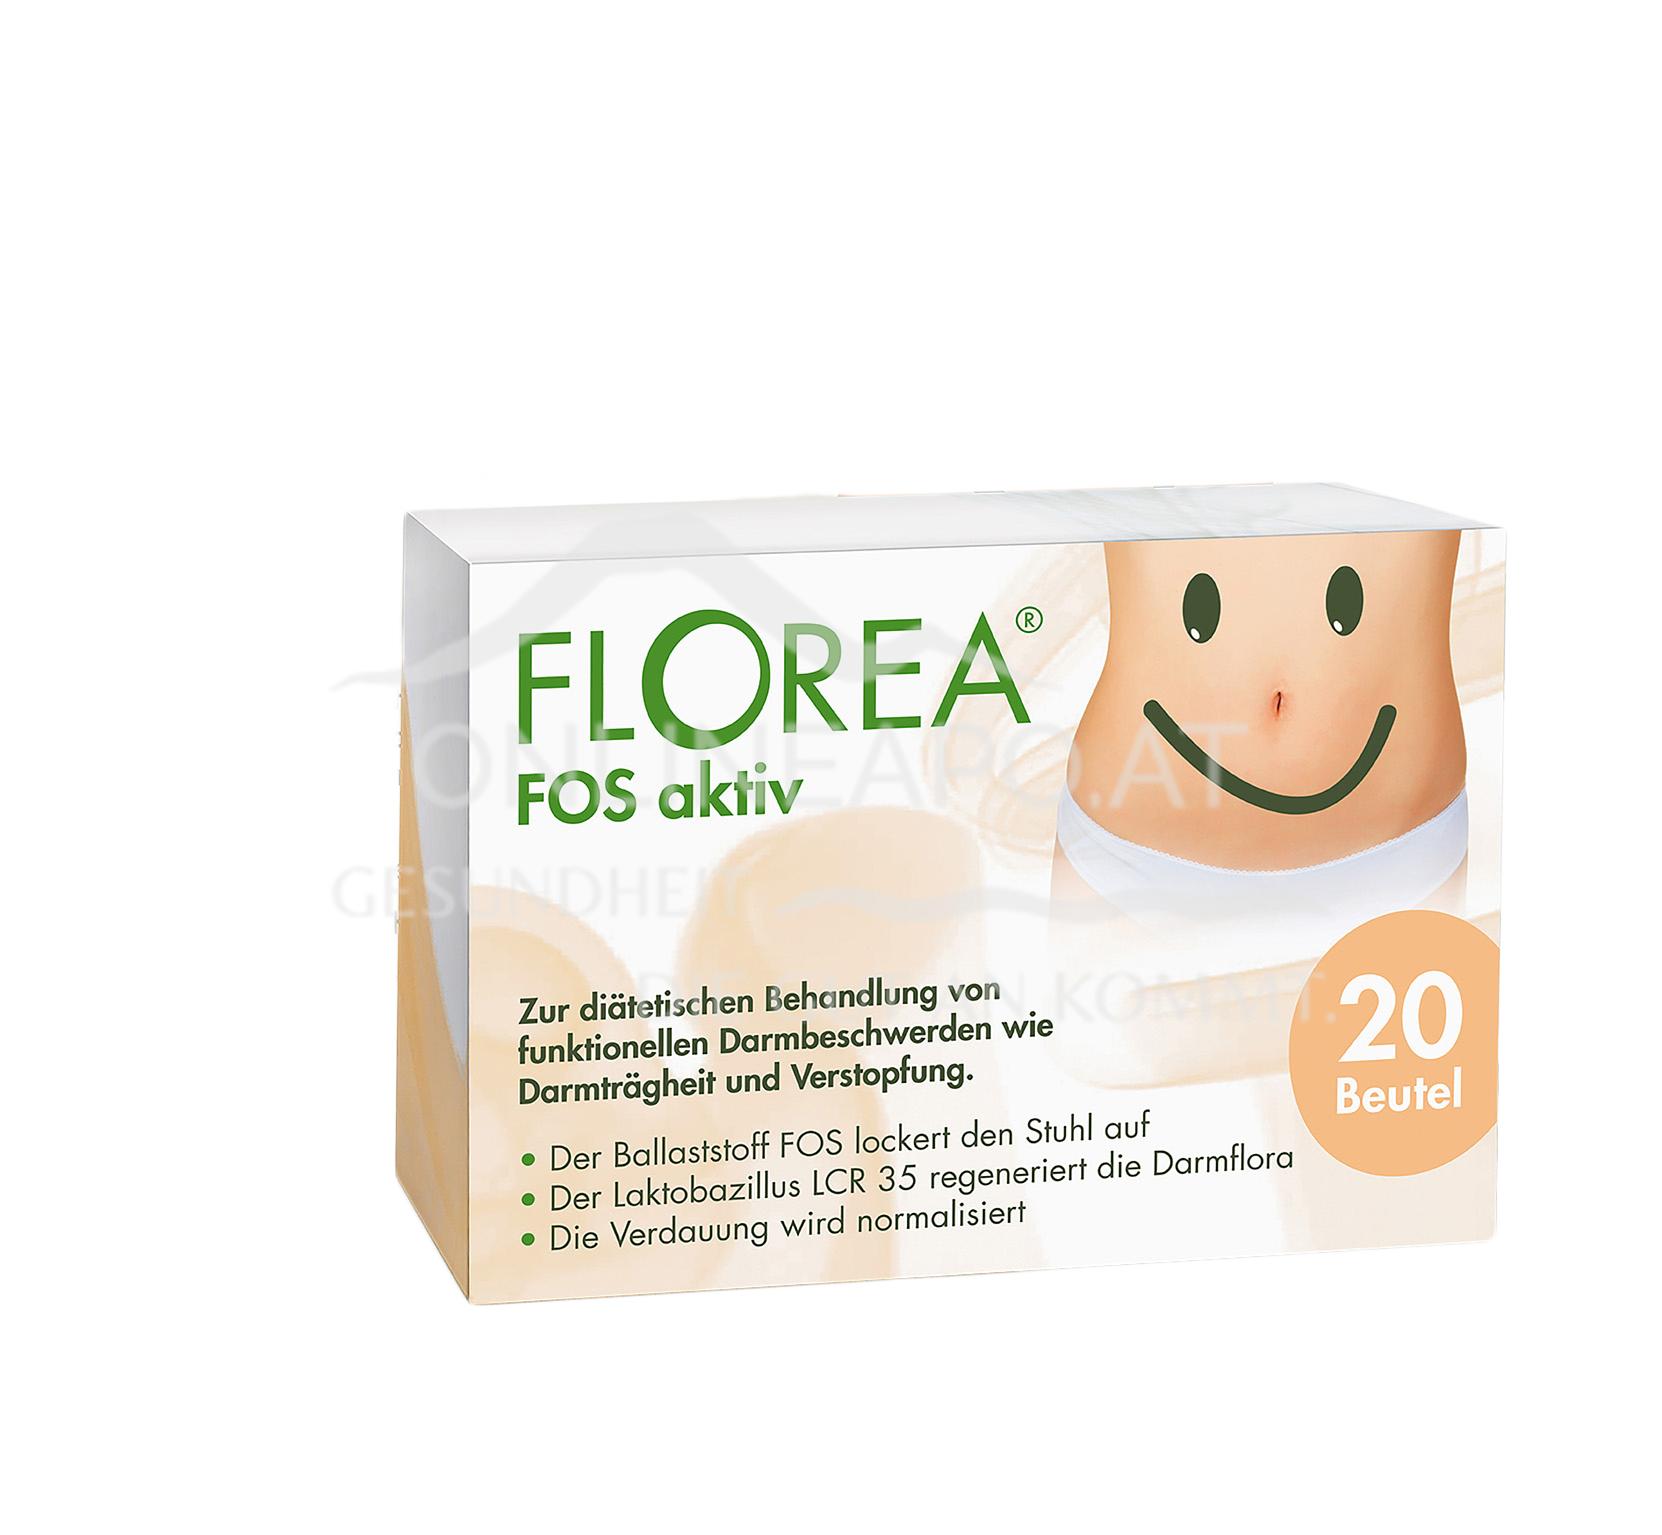 Florea FOS aktiv Beutel